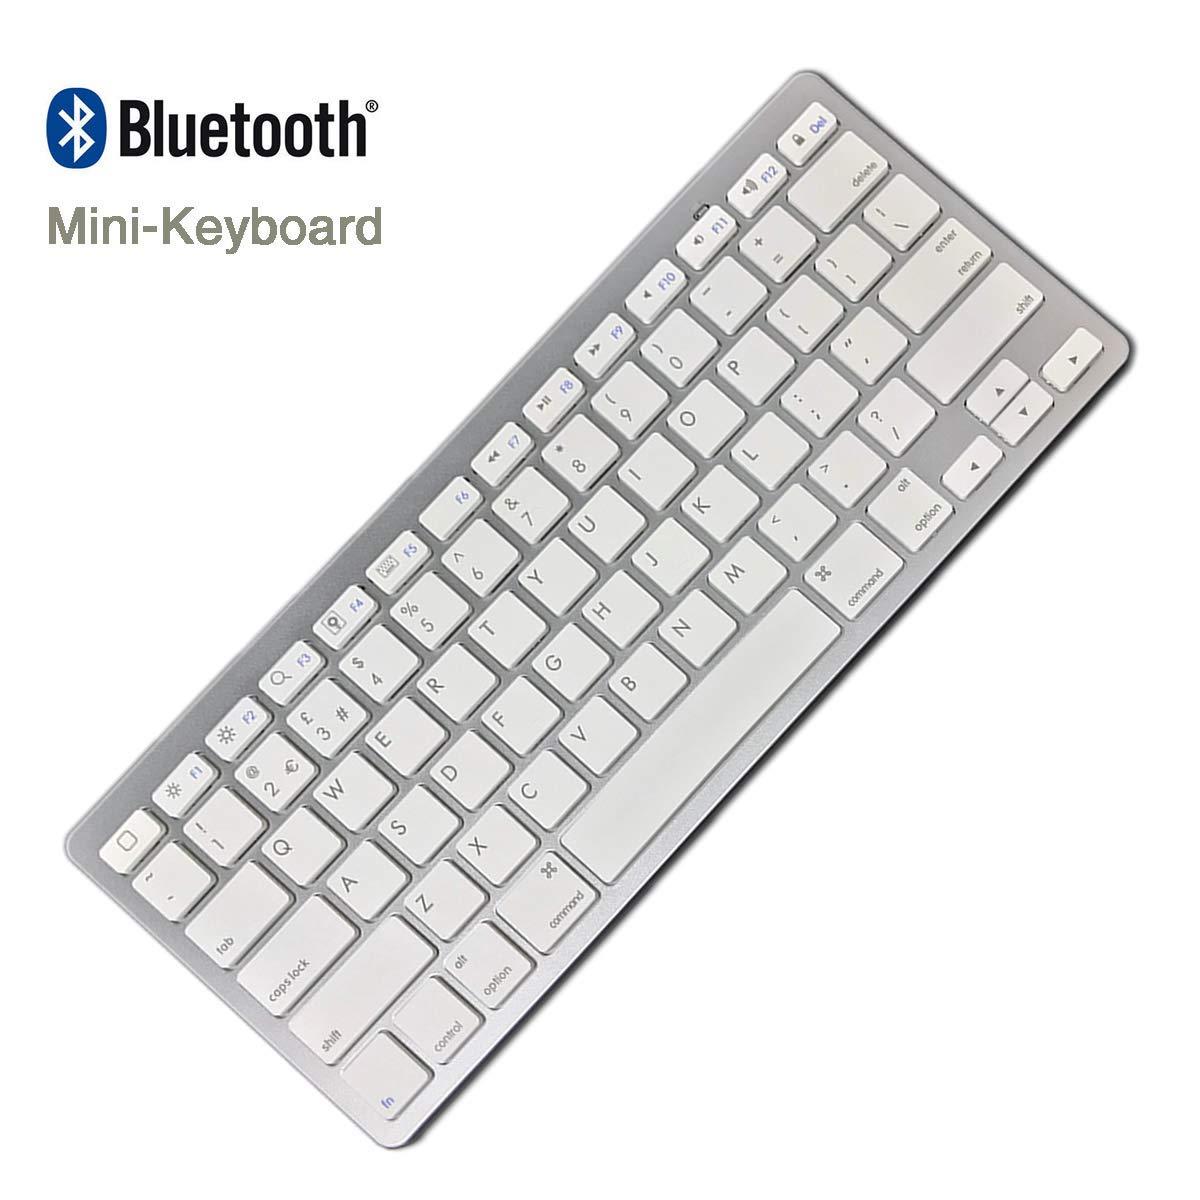 Windows iPad Air iPad 2//3//4 Mac Bluetooth Wireless Keyboard for iPhone iPad Mini and any bluetooth enabled device - White British Layout Galaxy Tab iPad Pro